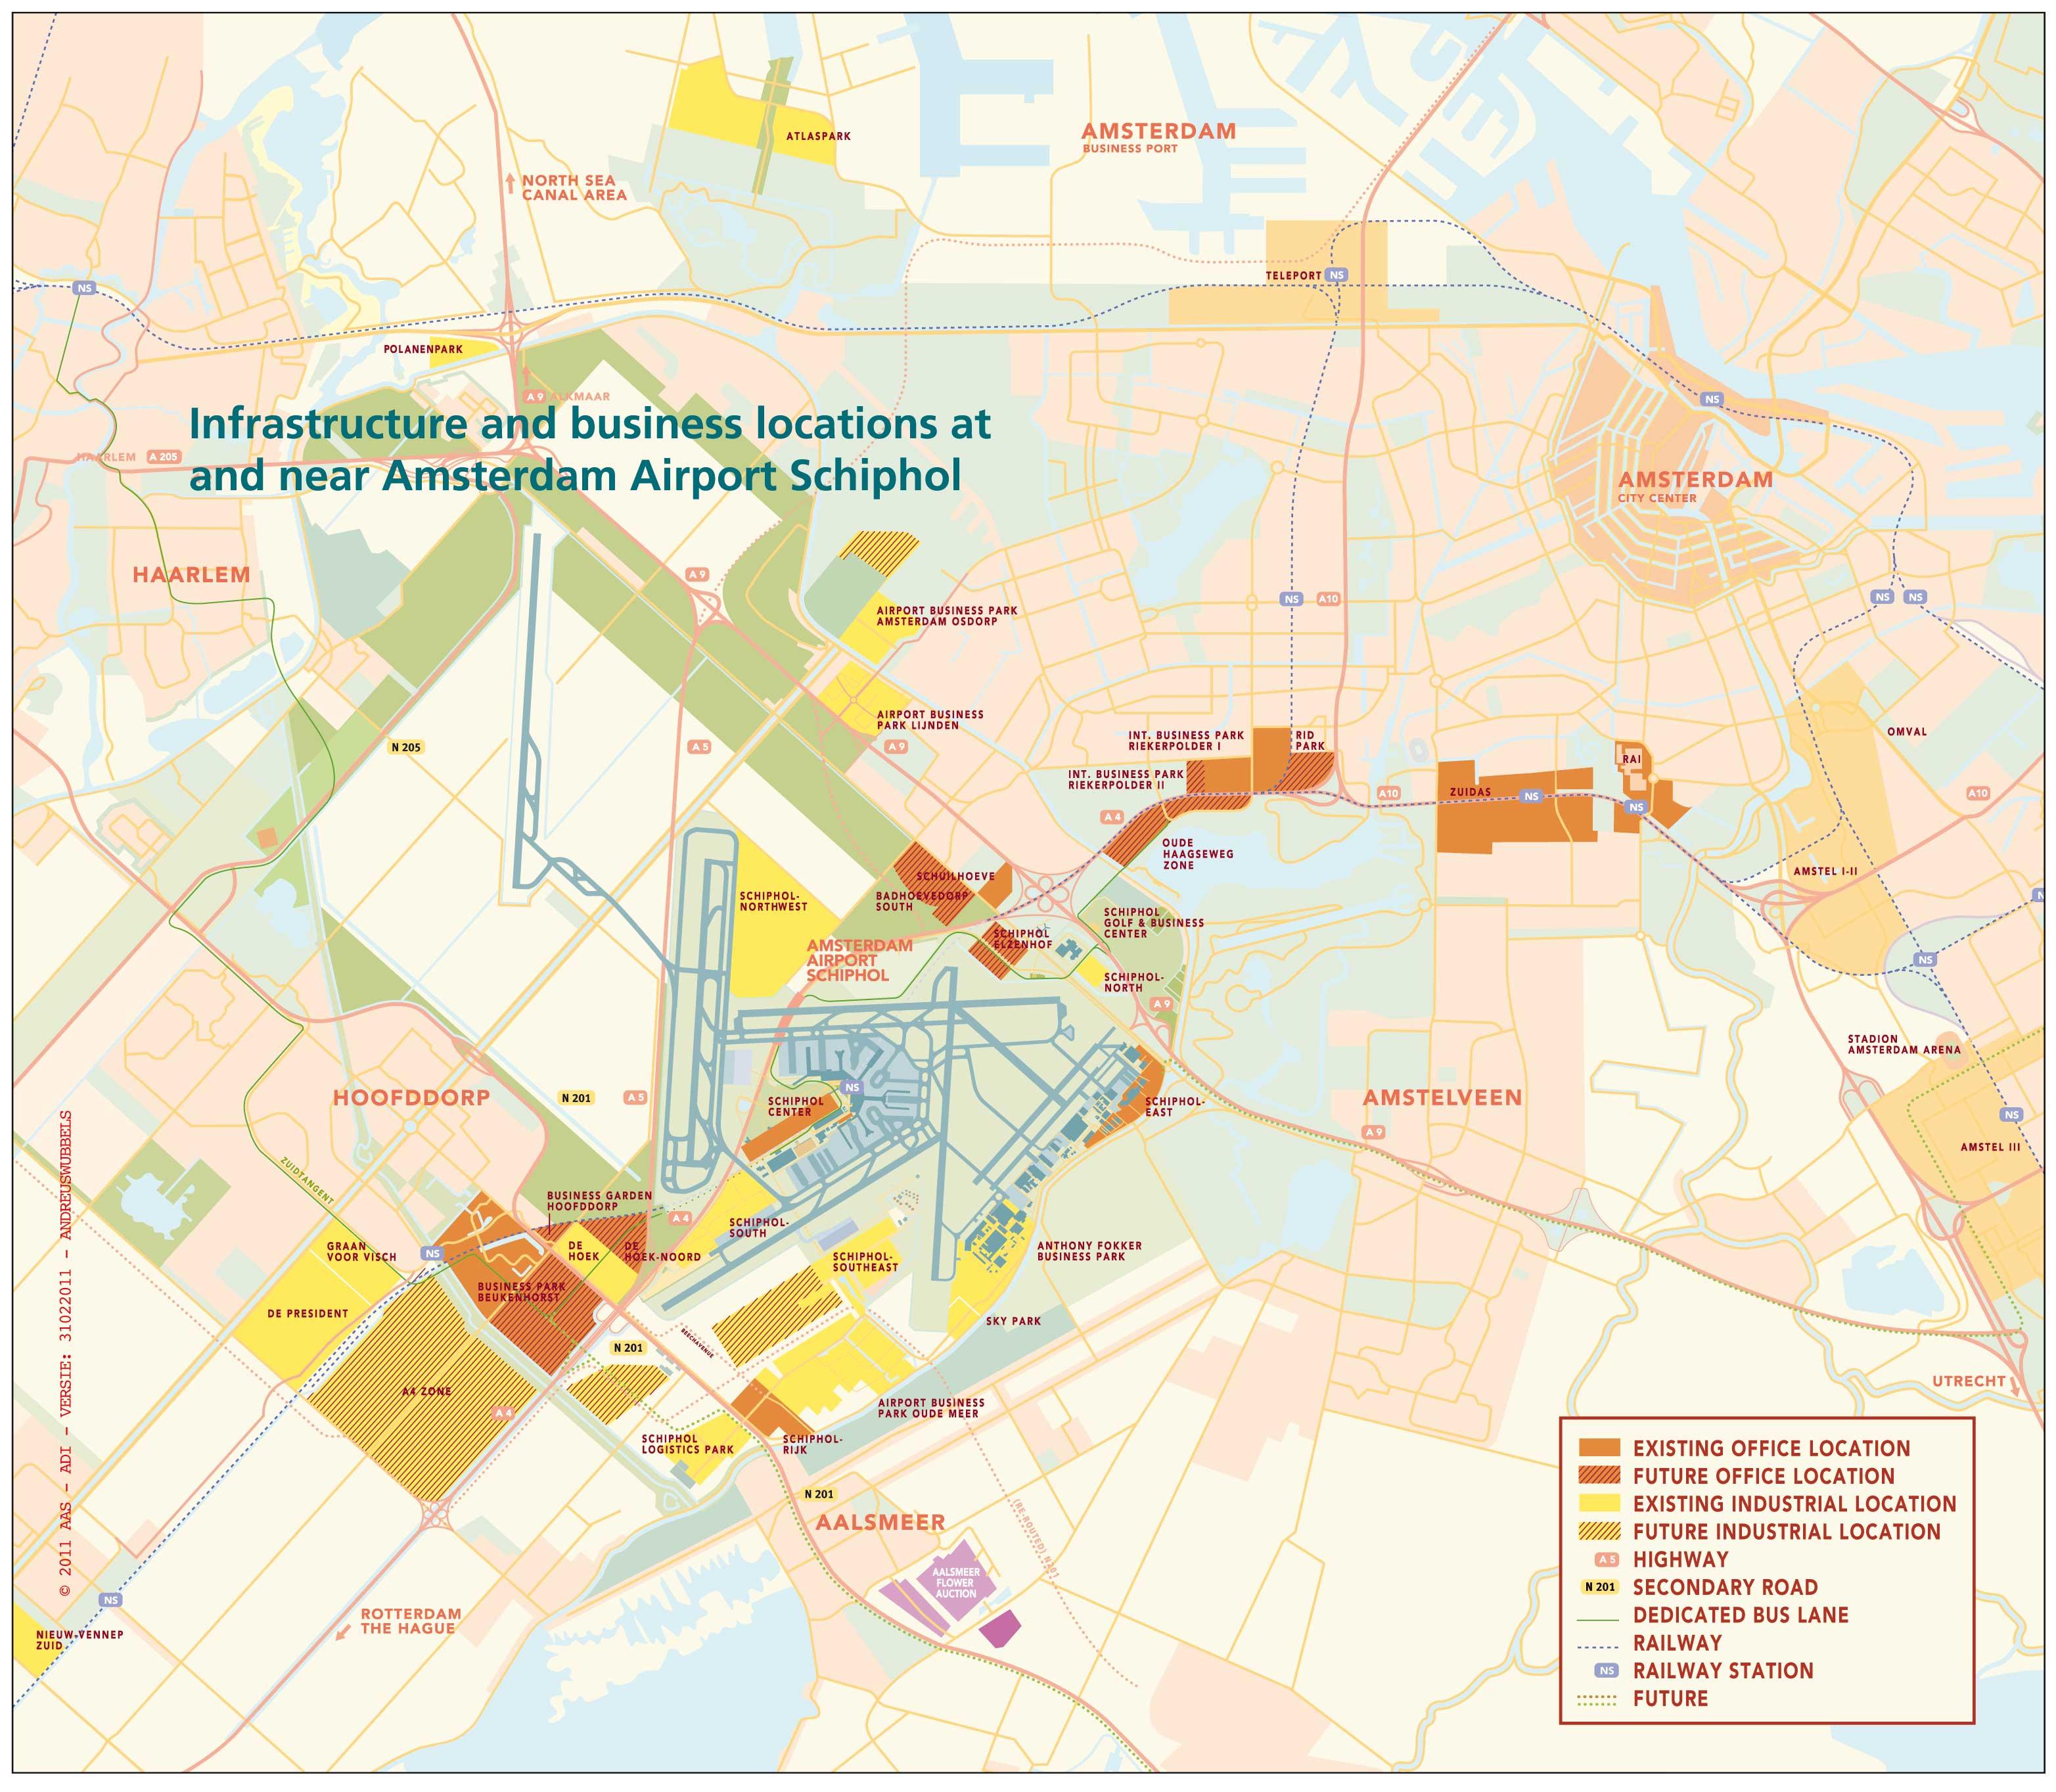 wwwrotterdamtransportcom Airfreight Map Amsterdam Airport Schiphol